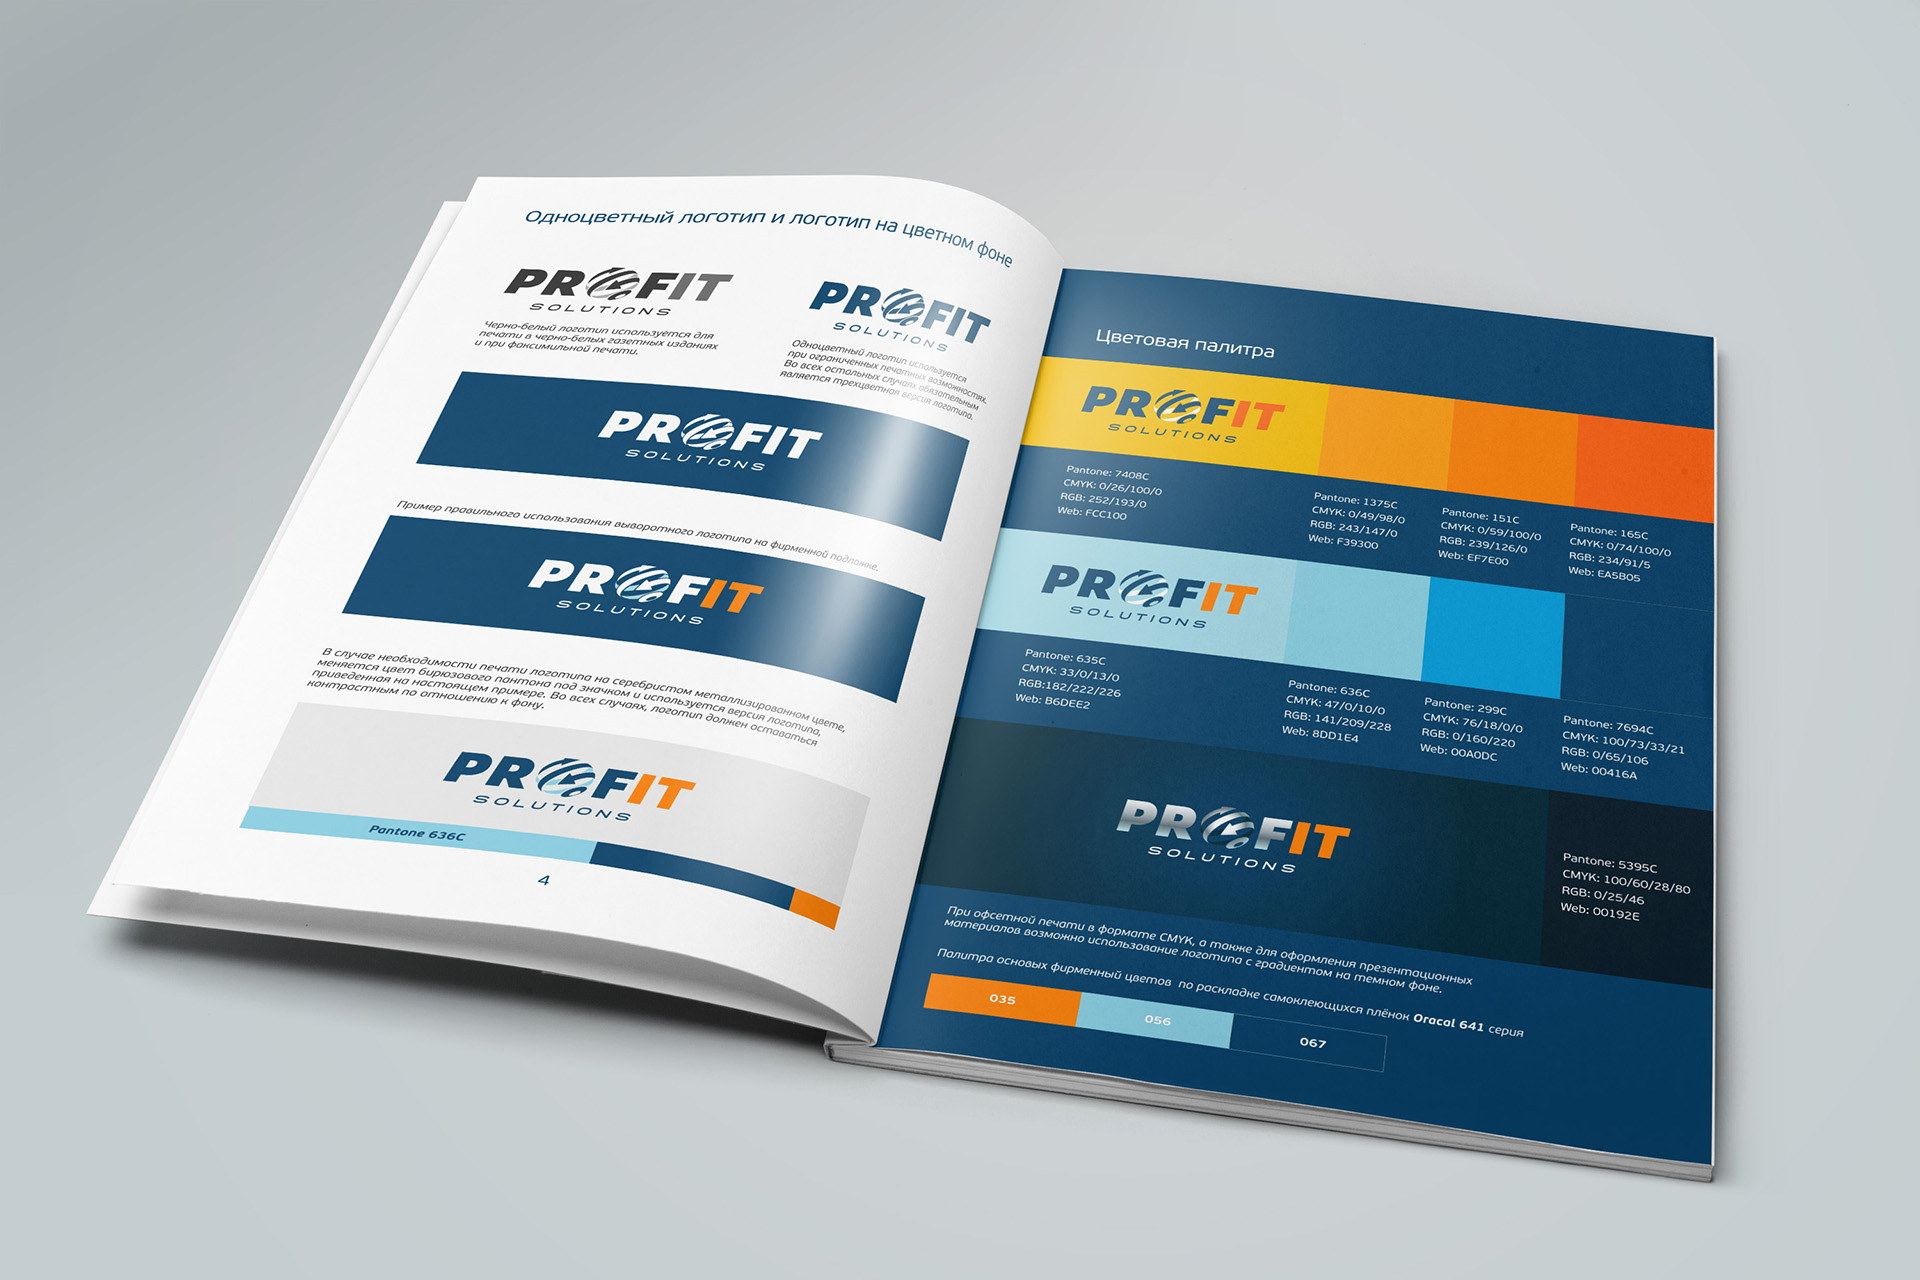 Брендбук IT компании, IT company brandbook